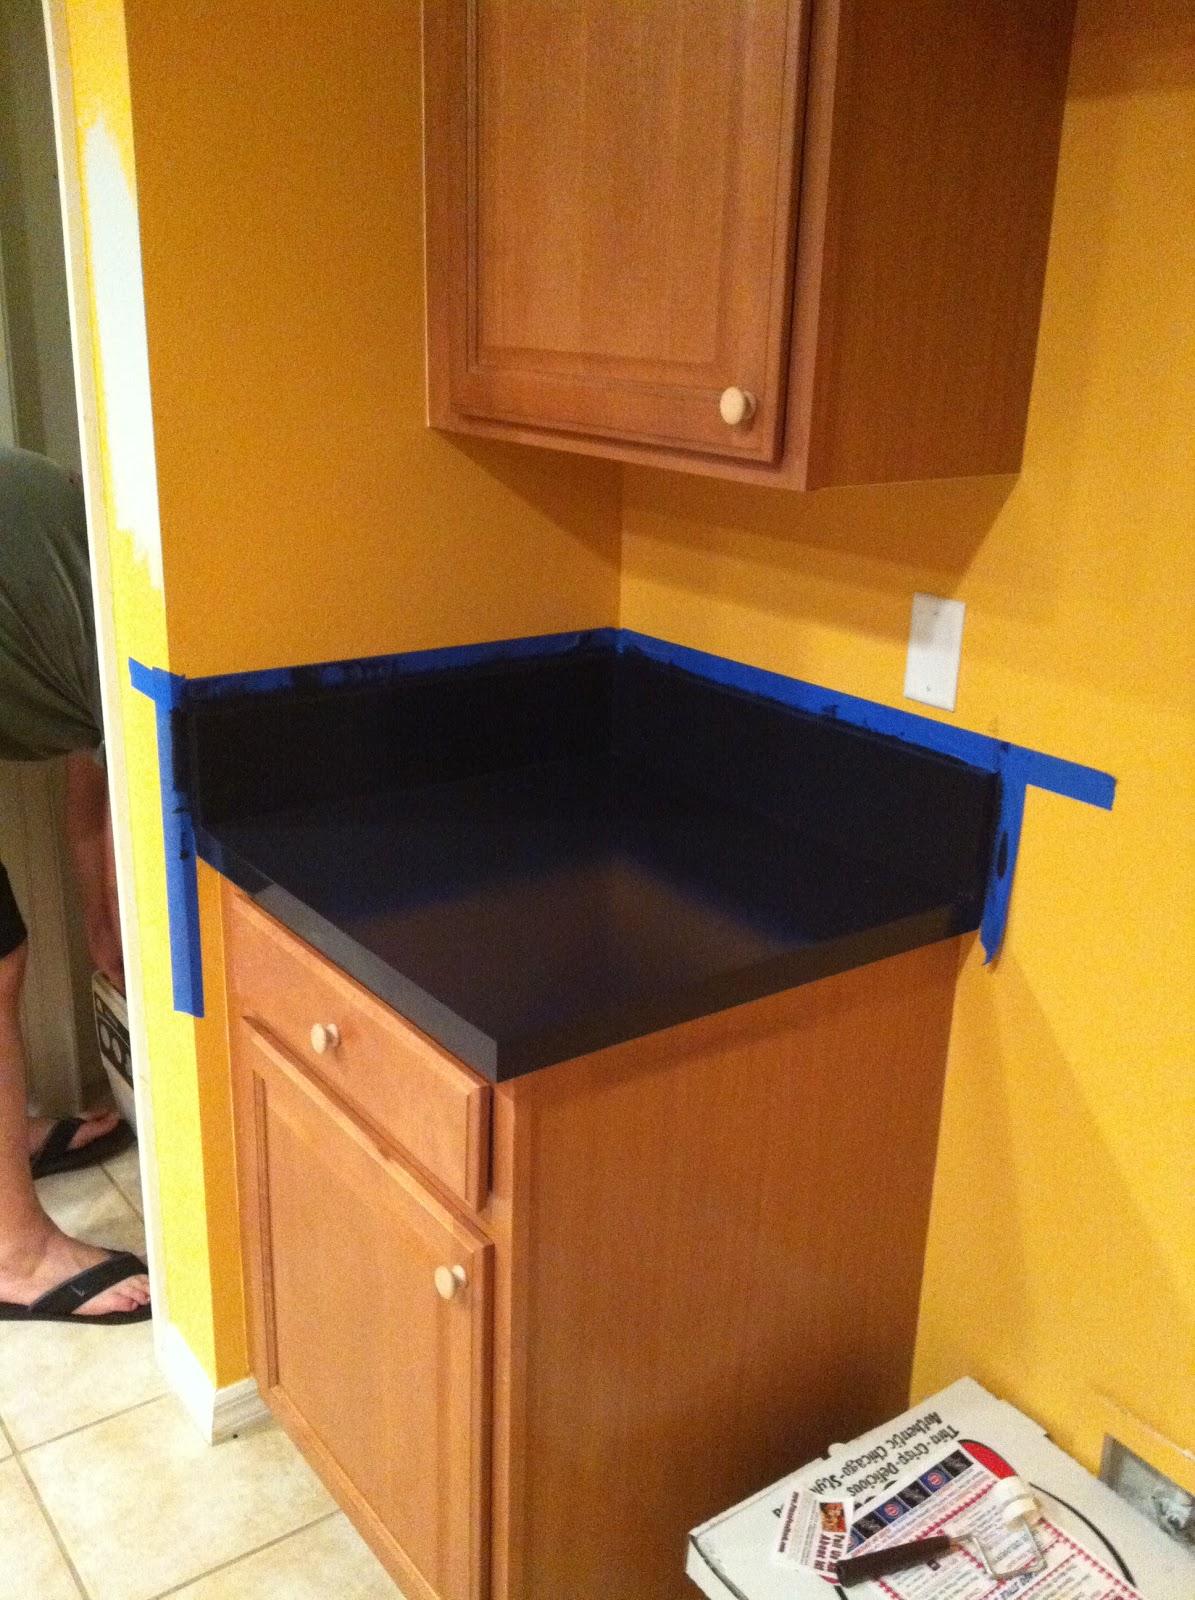 Rustoleum Countertop Paint Prep : Rustoleum actually has a Countertop Transformation kit, but it was ...